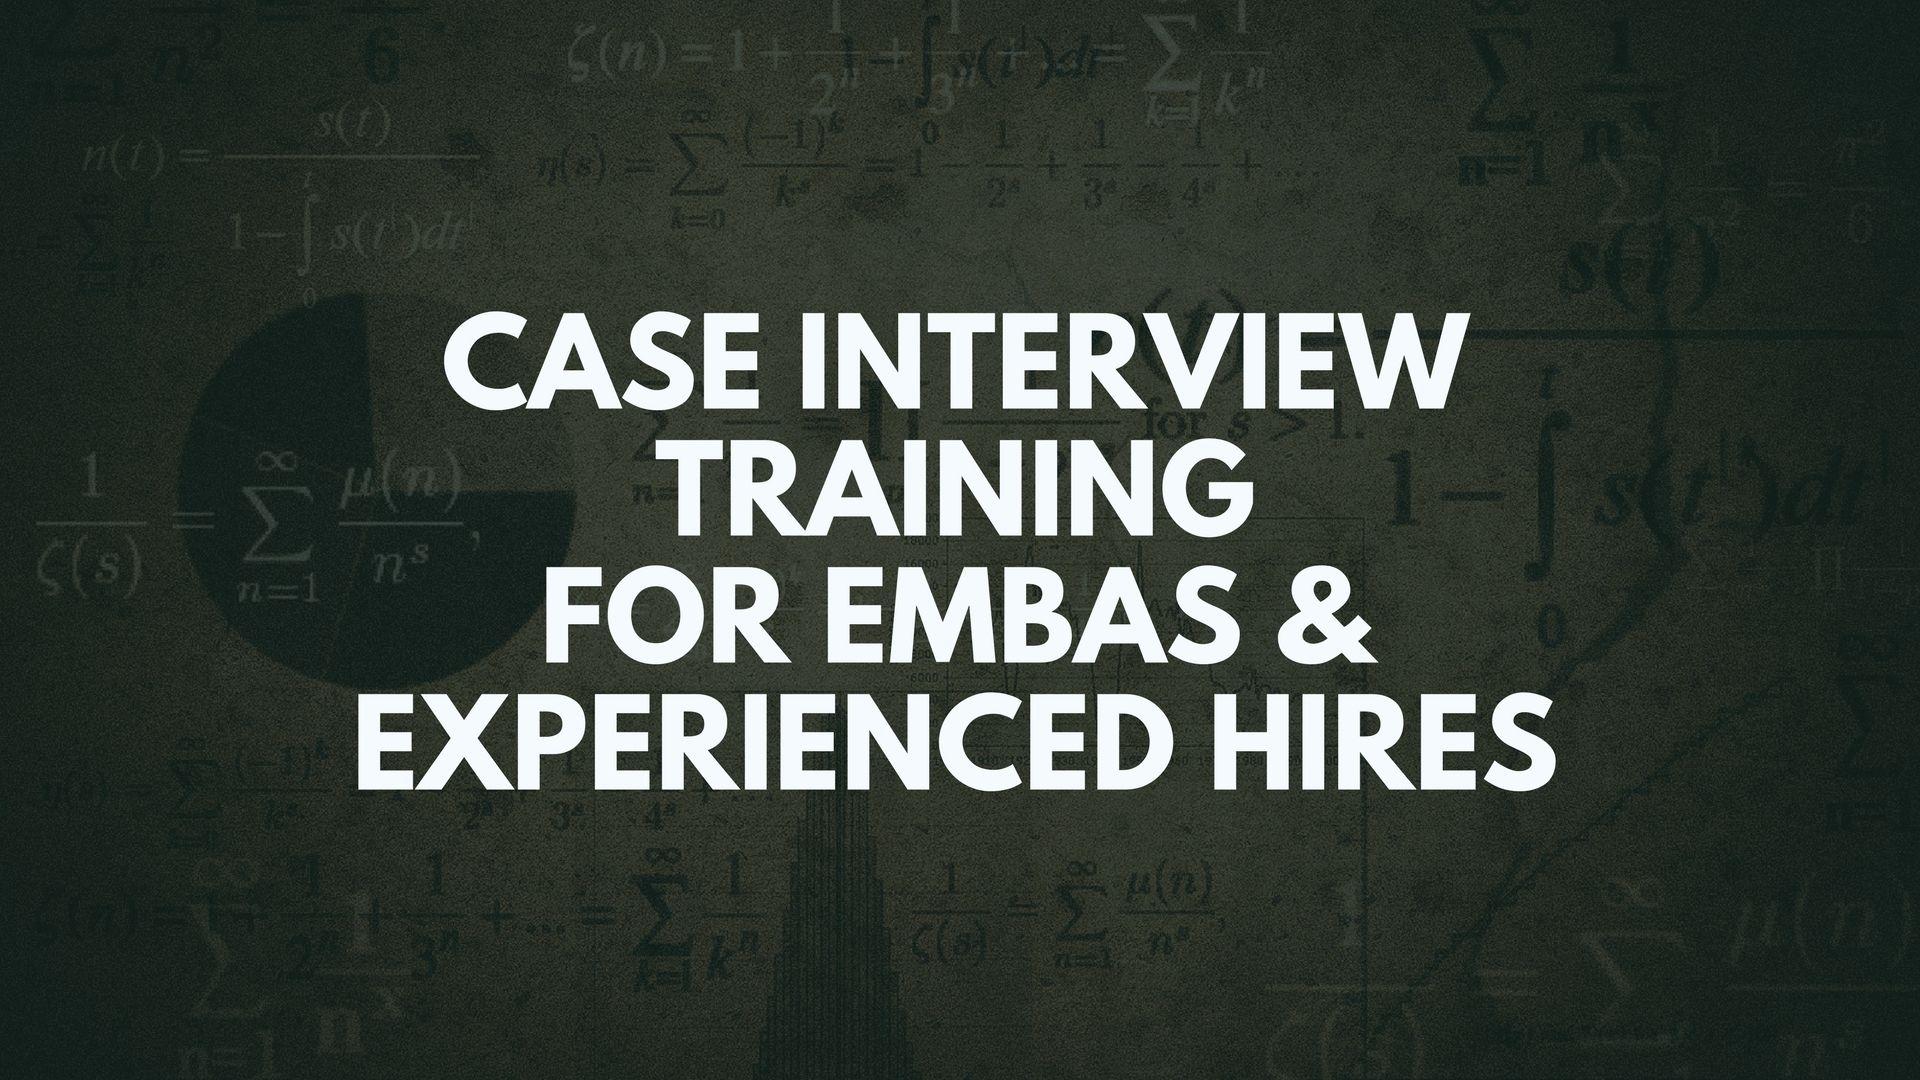 EMBA / Experienced Hire Case Interviews - Strategytraining.com